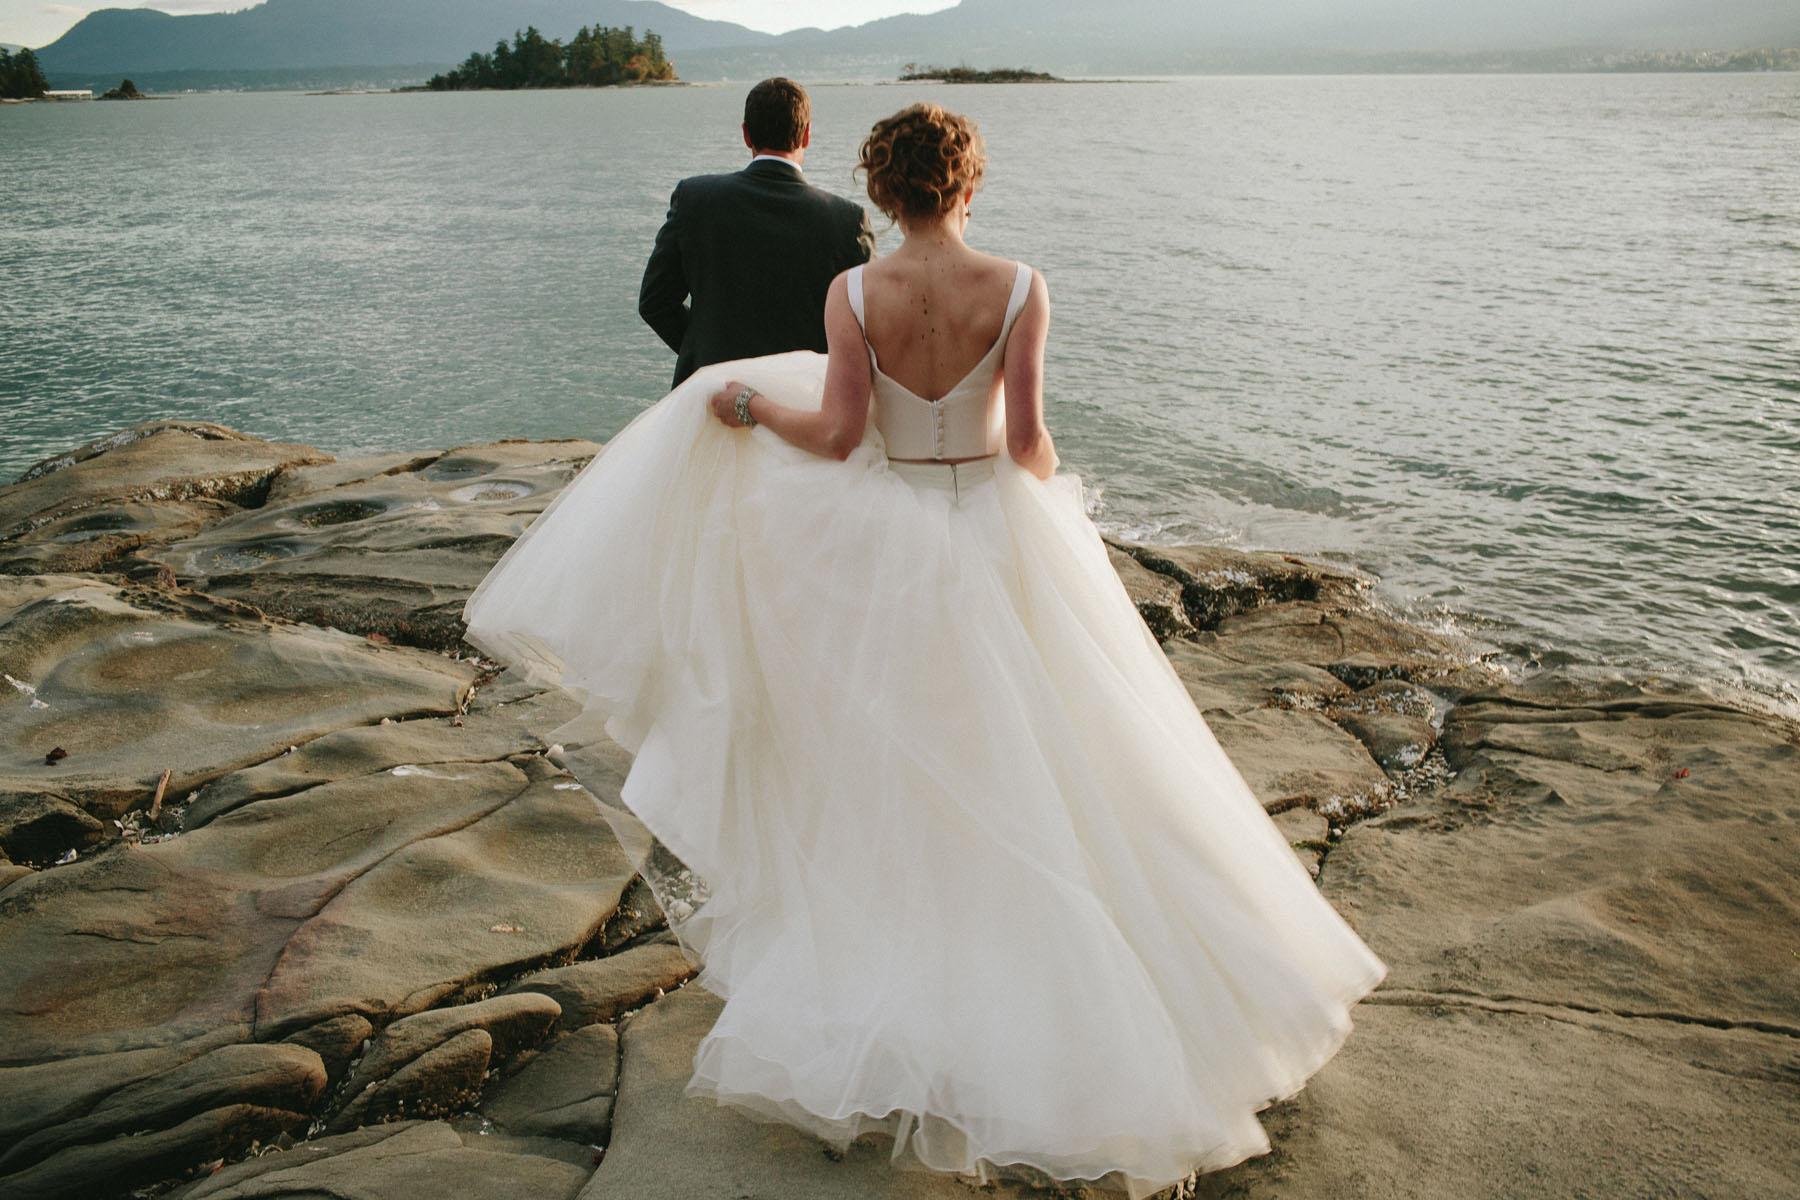 thetis-island-wedding-photographer-rp-rn-134.jpg